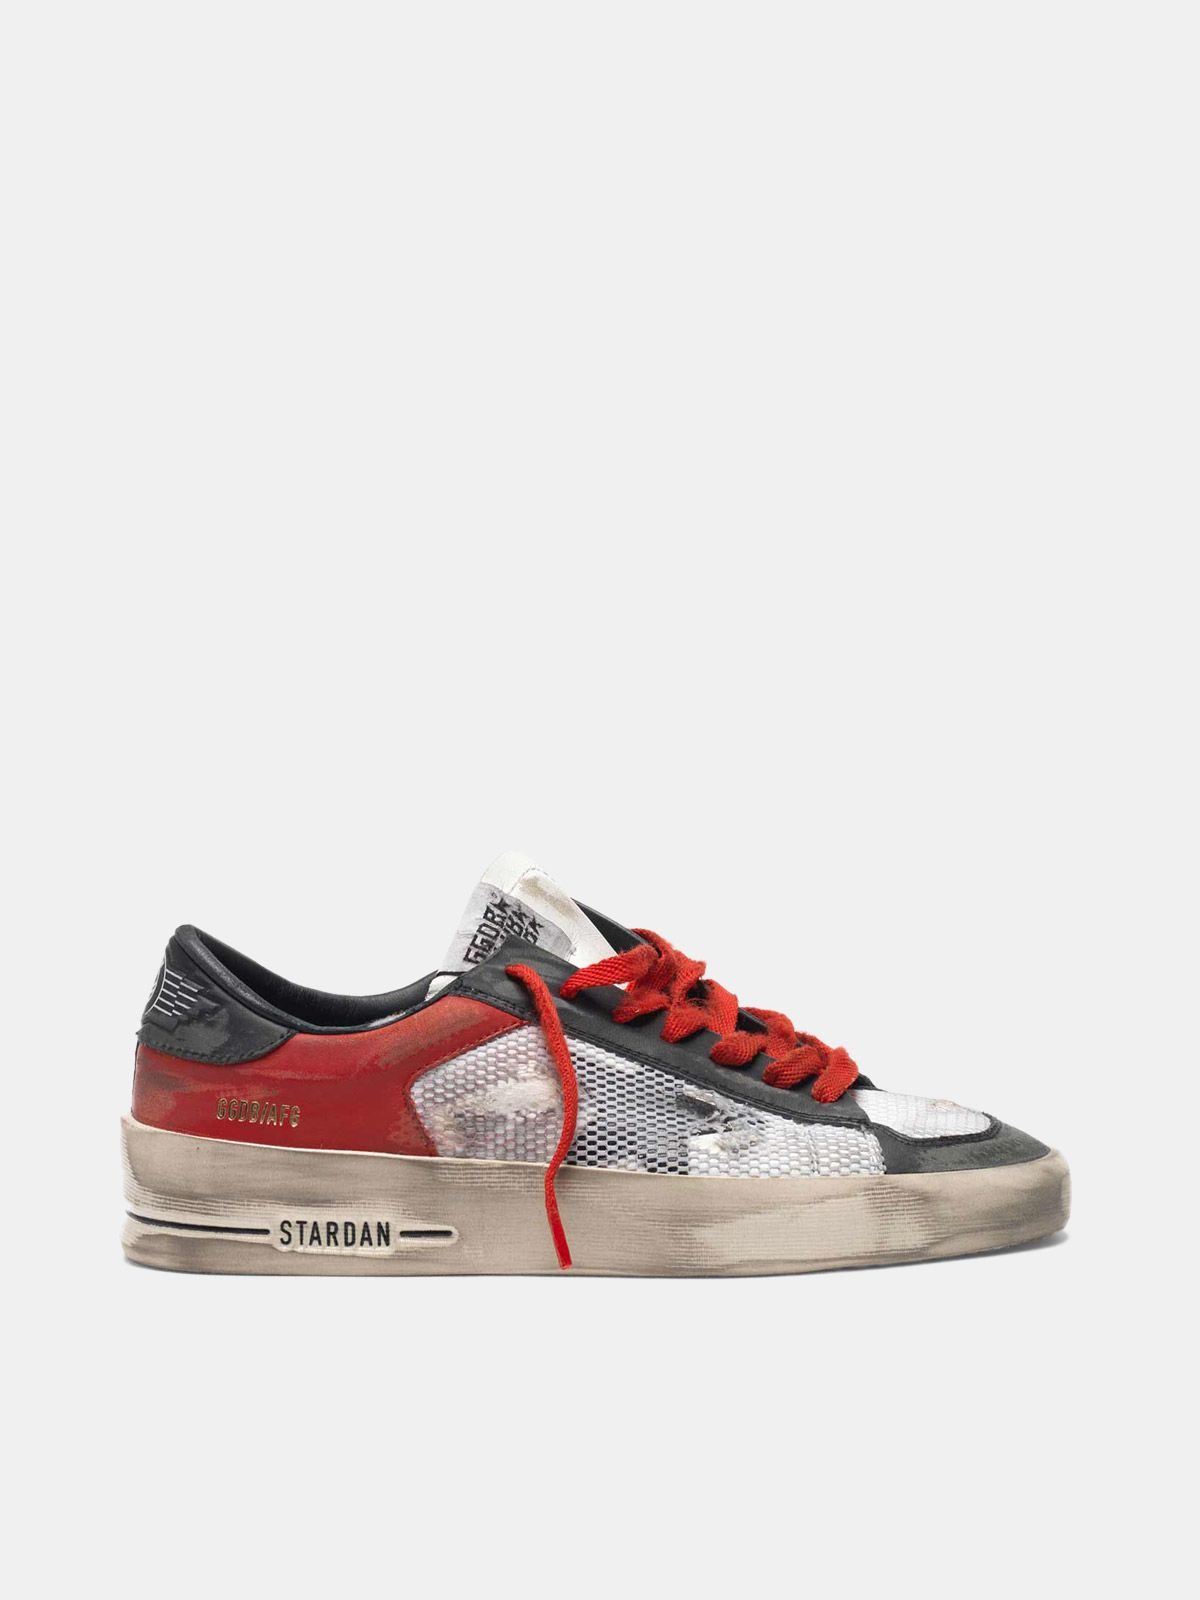 Golden Goose - Distressed black and red Stardan LTD sneakers  in